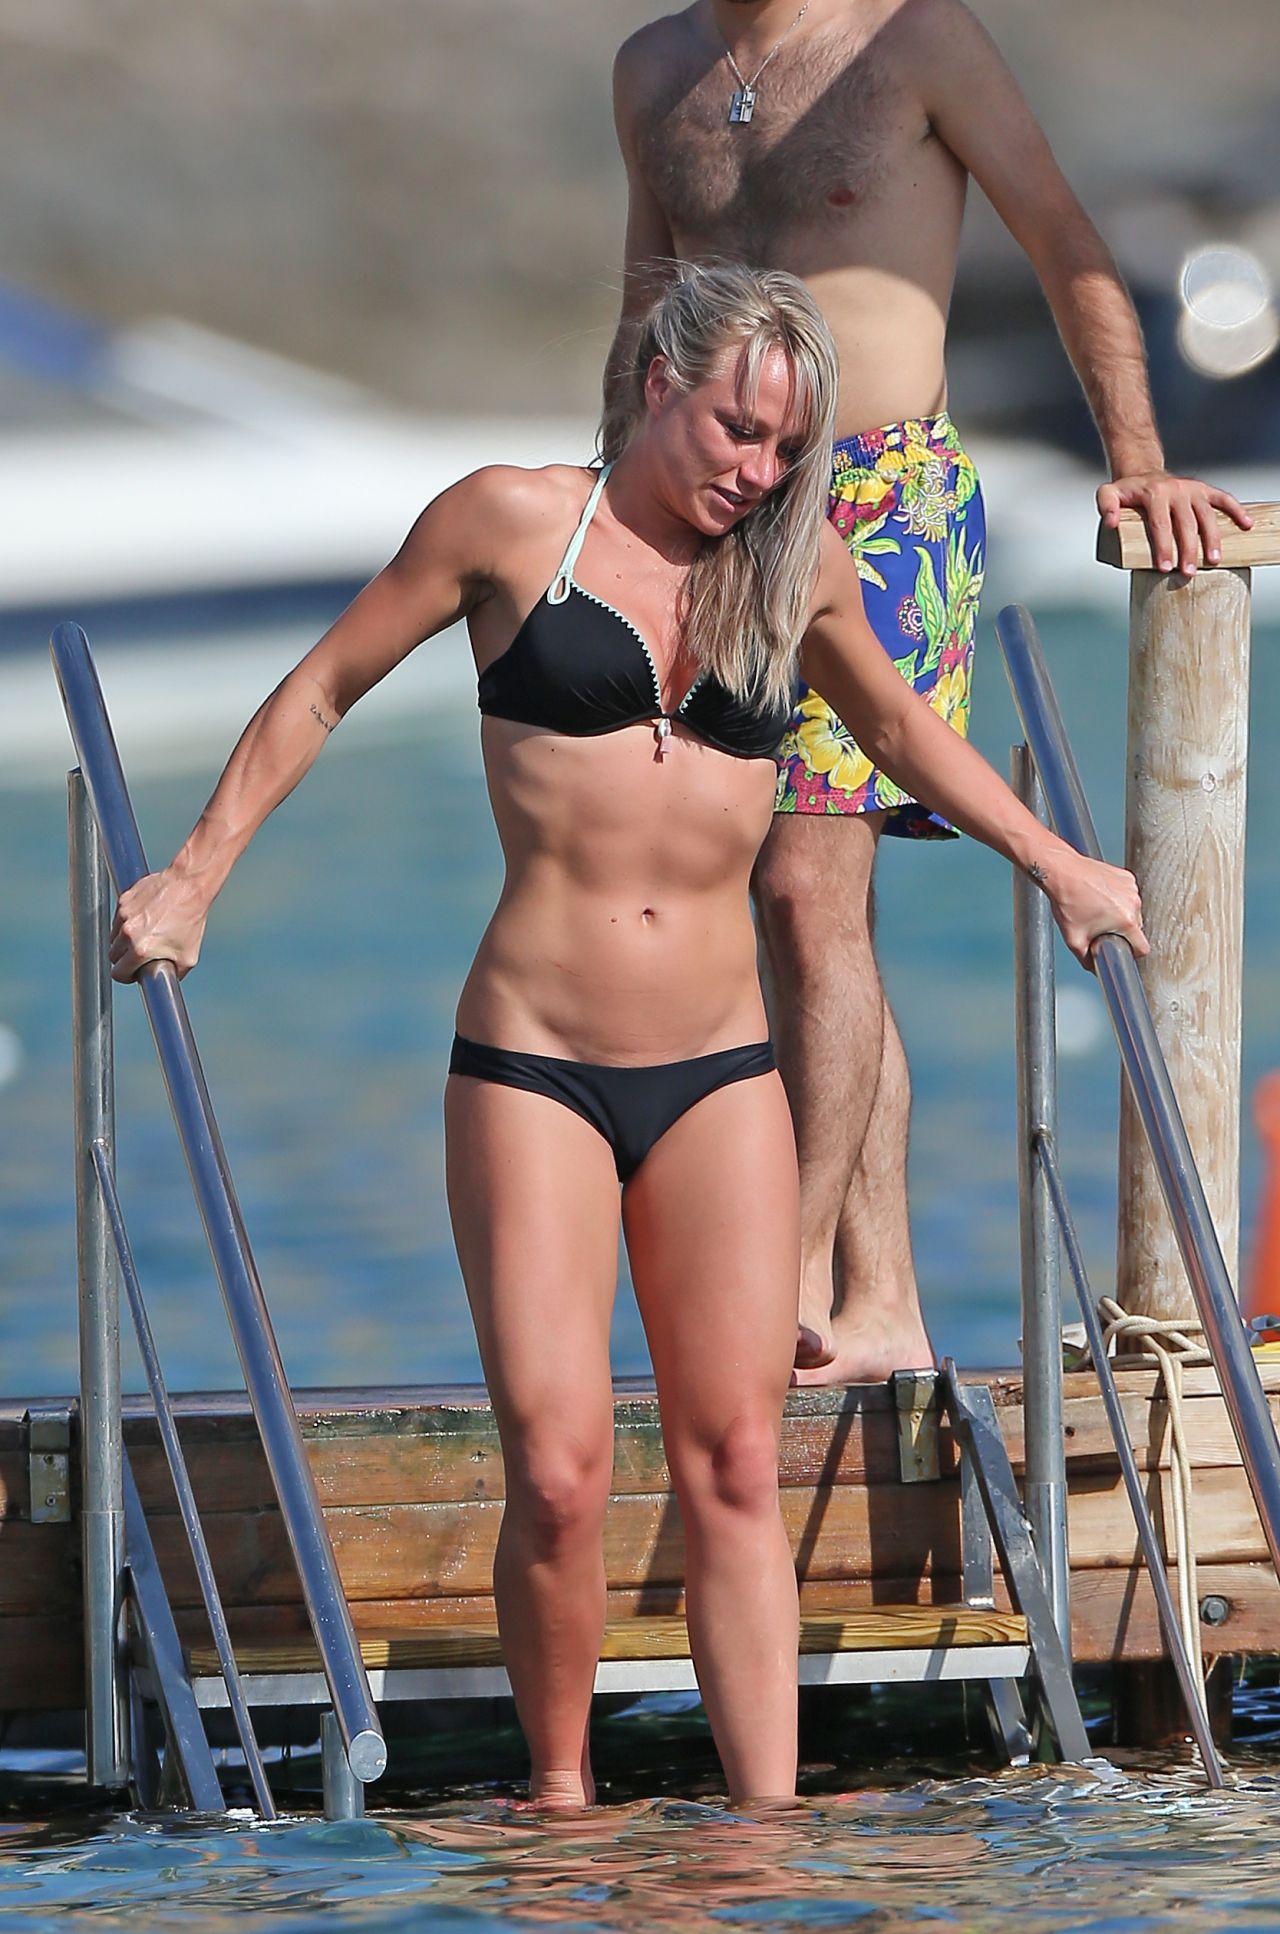 Chloe madeley bikini - 2019 year